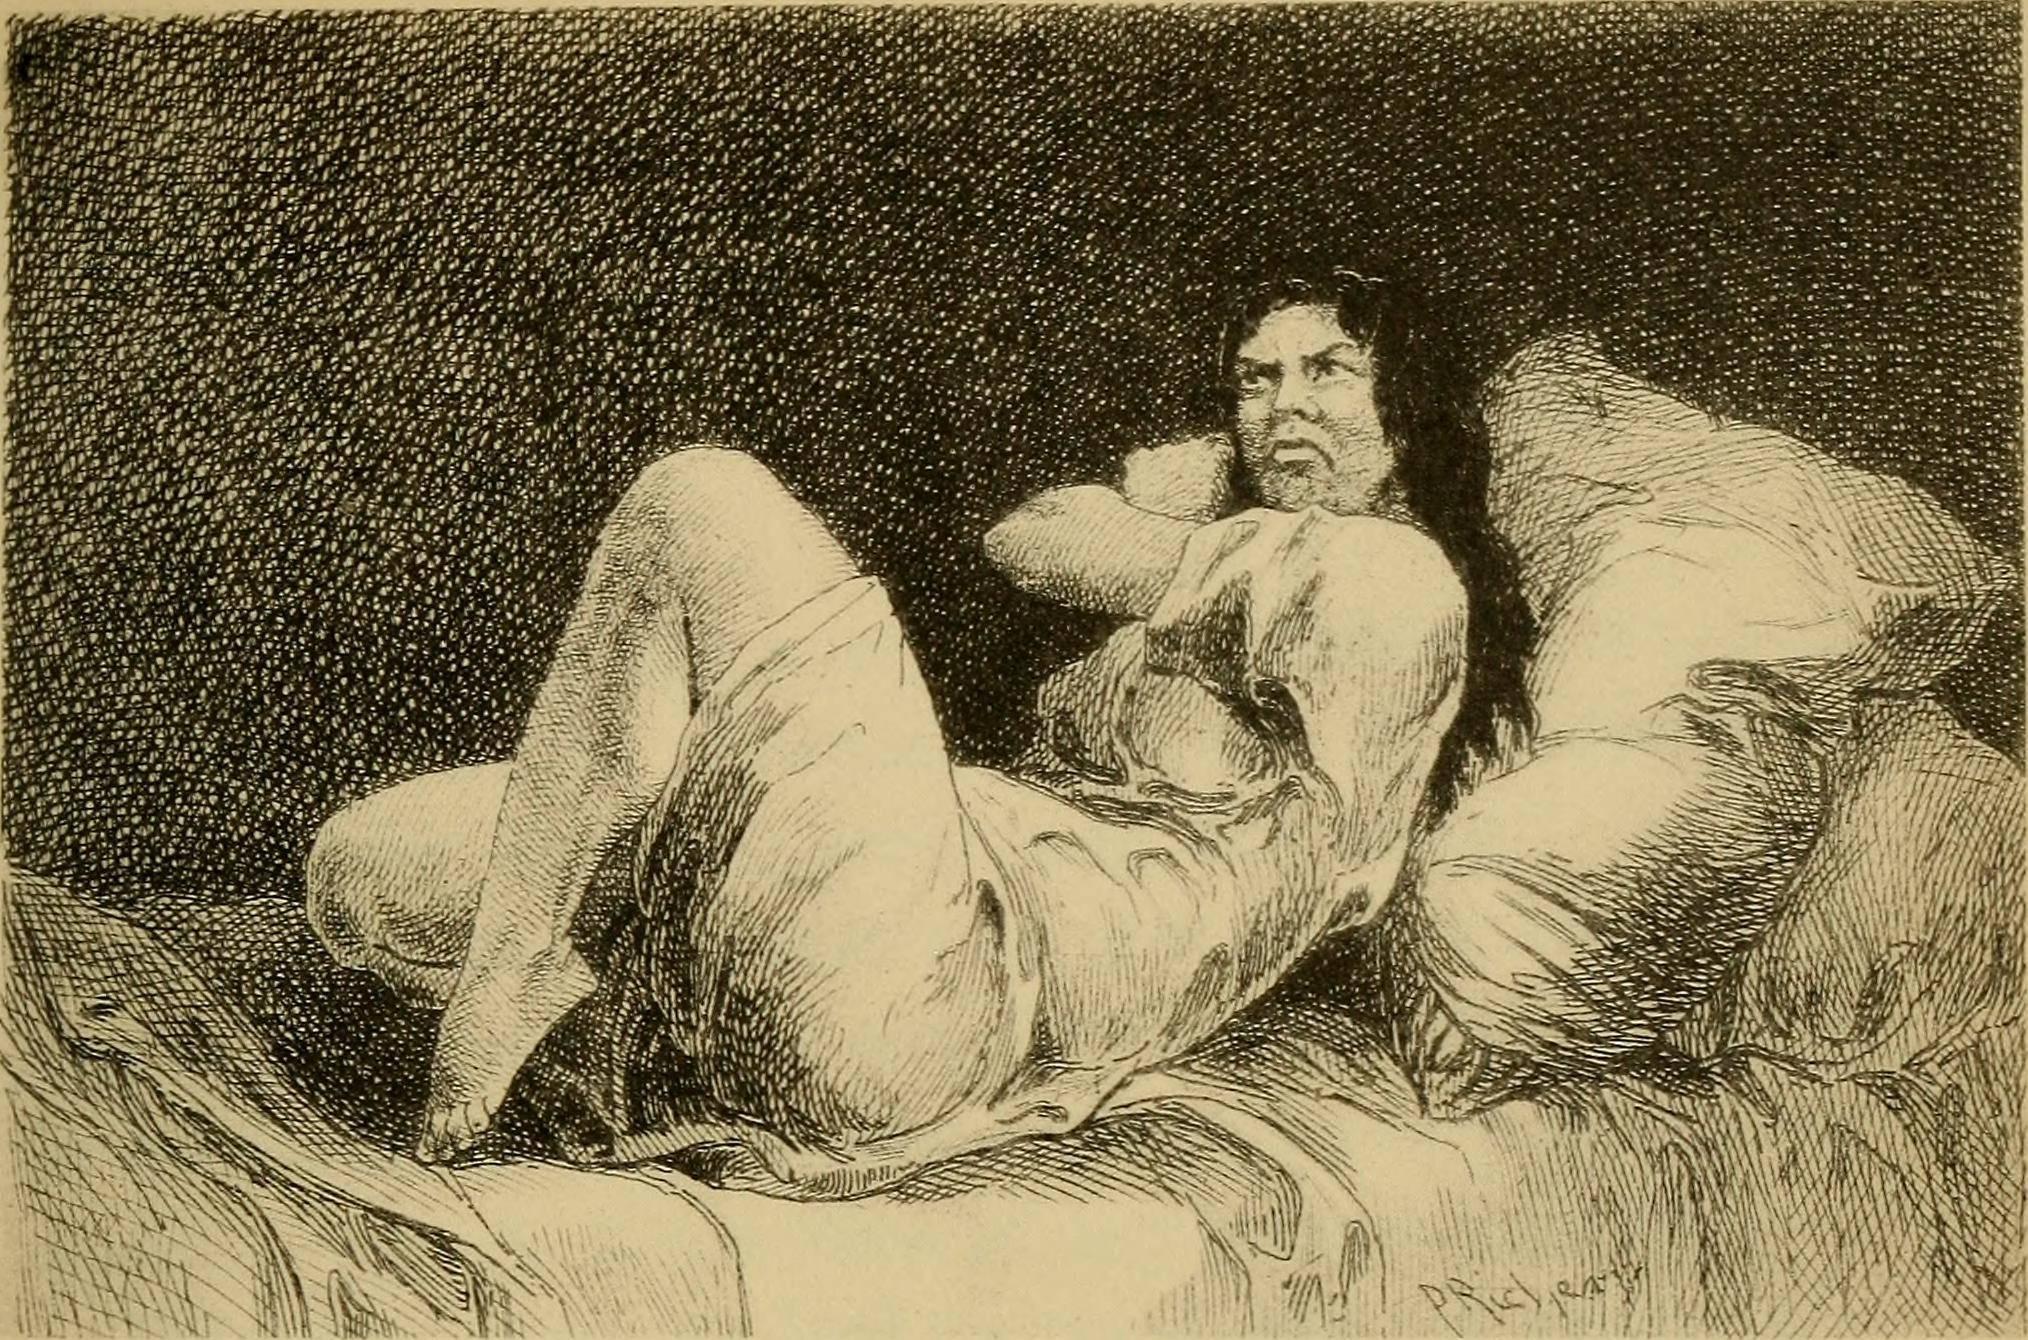 Бешенство матки – симптомы, фото, причины и симптоматика заболевания.